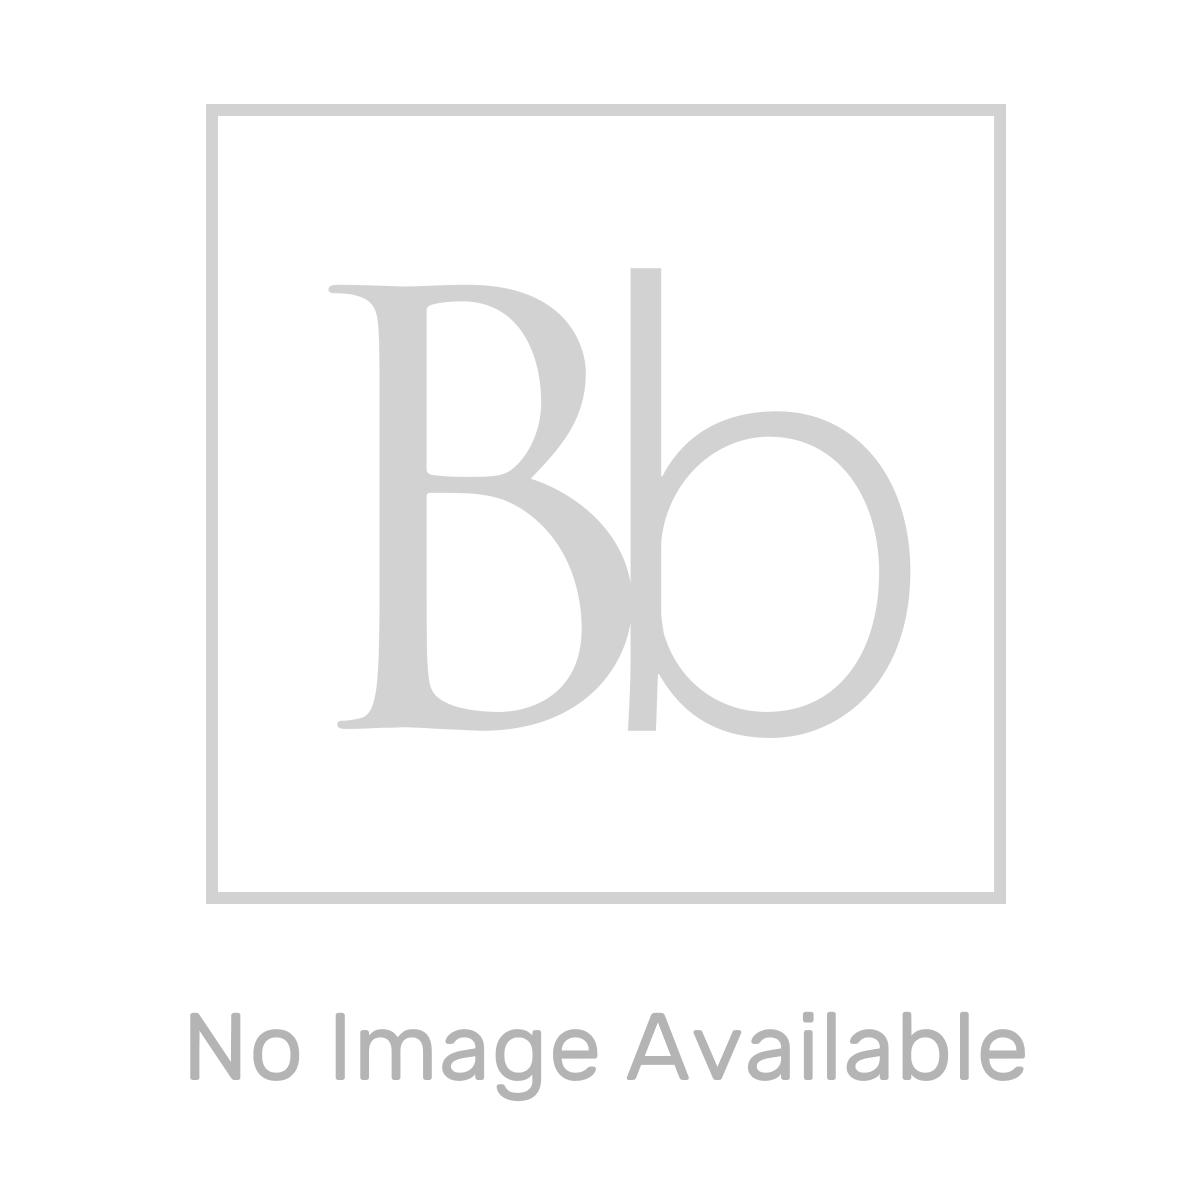 46 Strip LED Battery Operated Bathroom Mirror 650 x 500mm